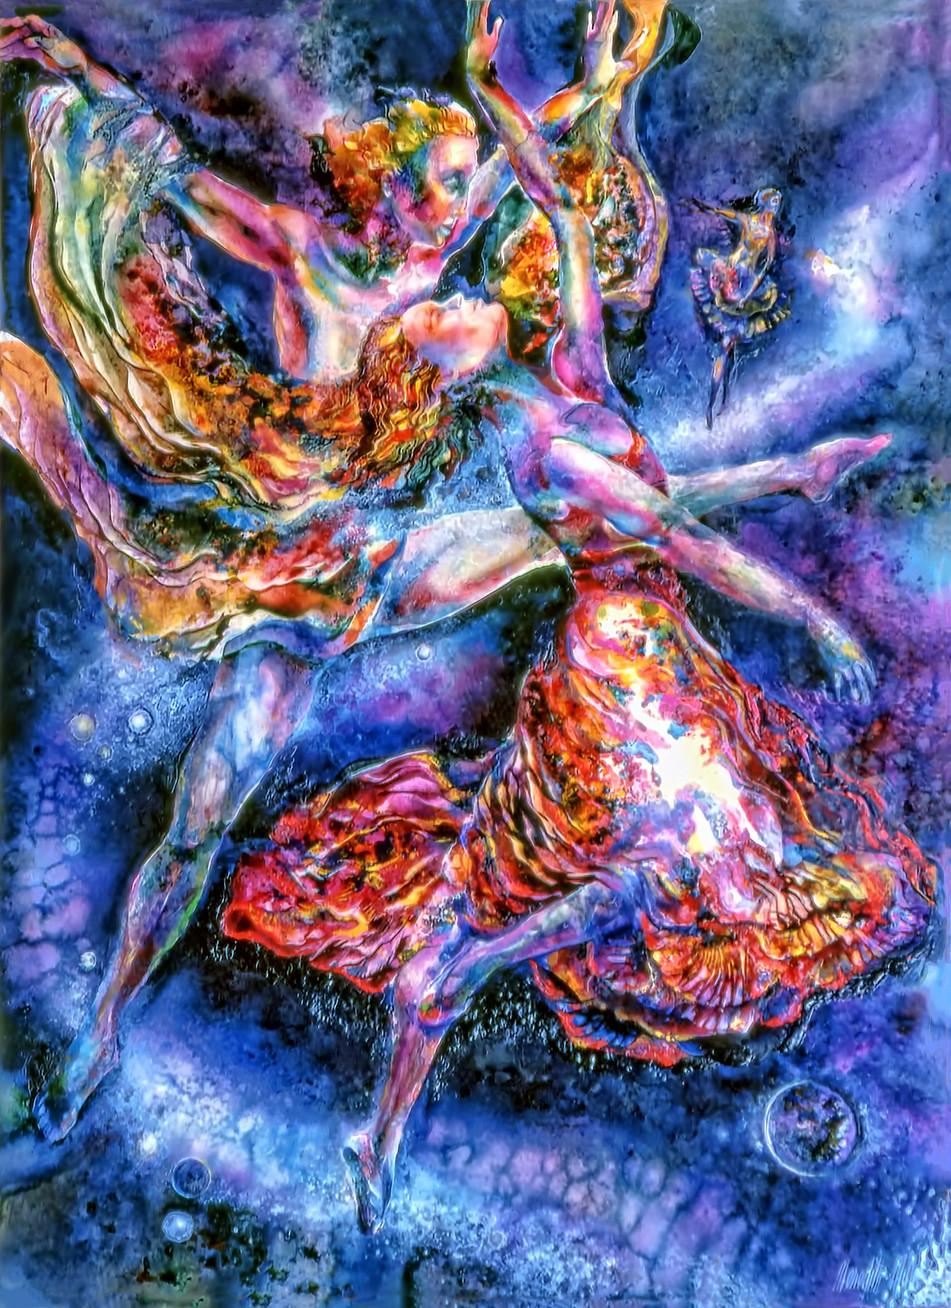 1983 - COSMIC DANCERS - Oil and watercolor - 30X40